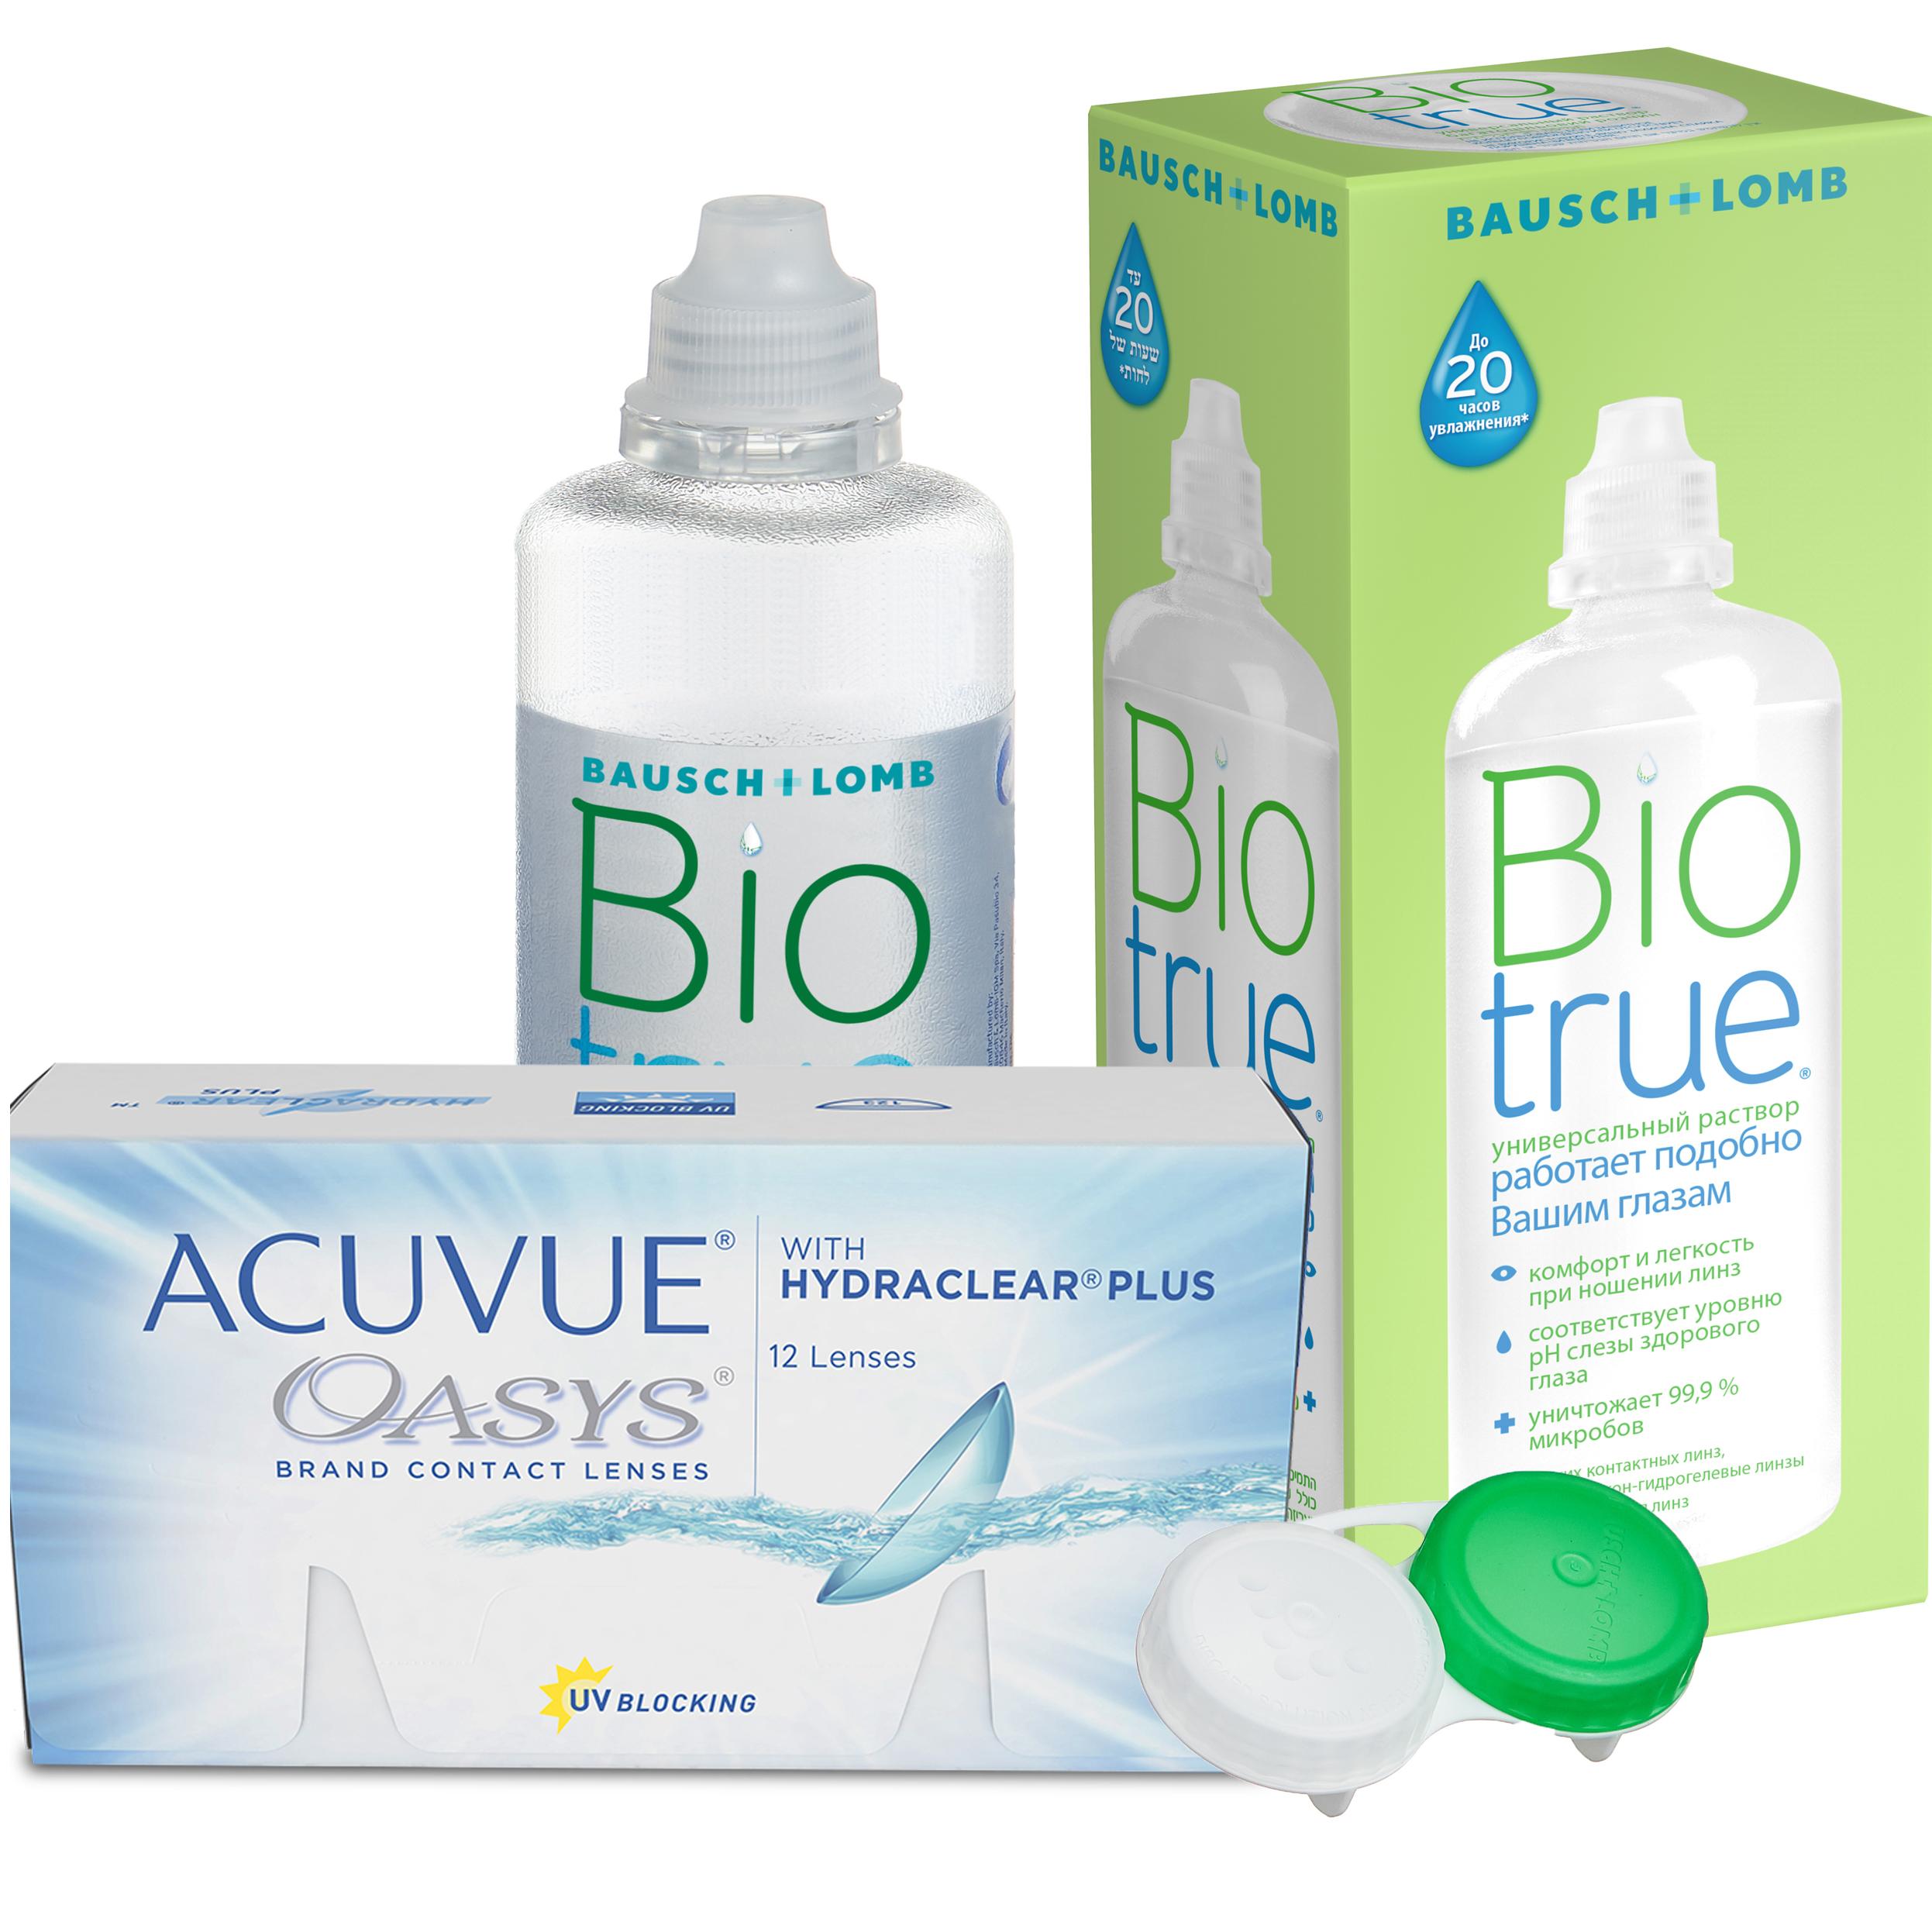 Купить Oasys with Hydraclear Plus 12 линз + Biotrue, Контактные линзы Acuvue Oasys with Hydraclear Plus 12 линз R 8.4 -4, 50 + Biotrue 300 мл